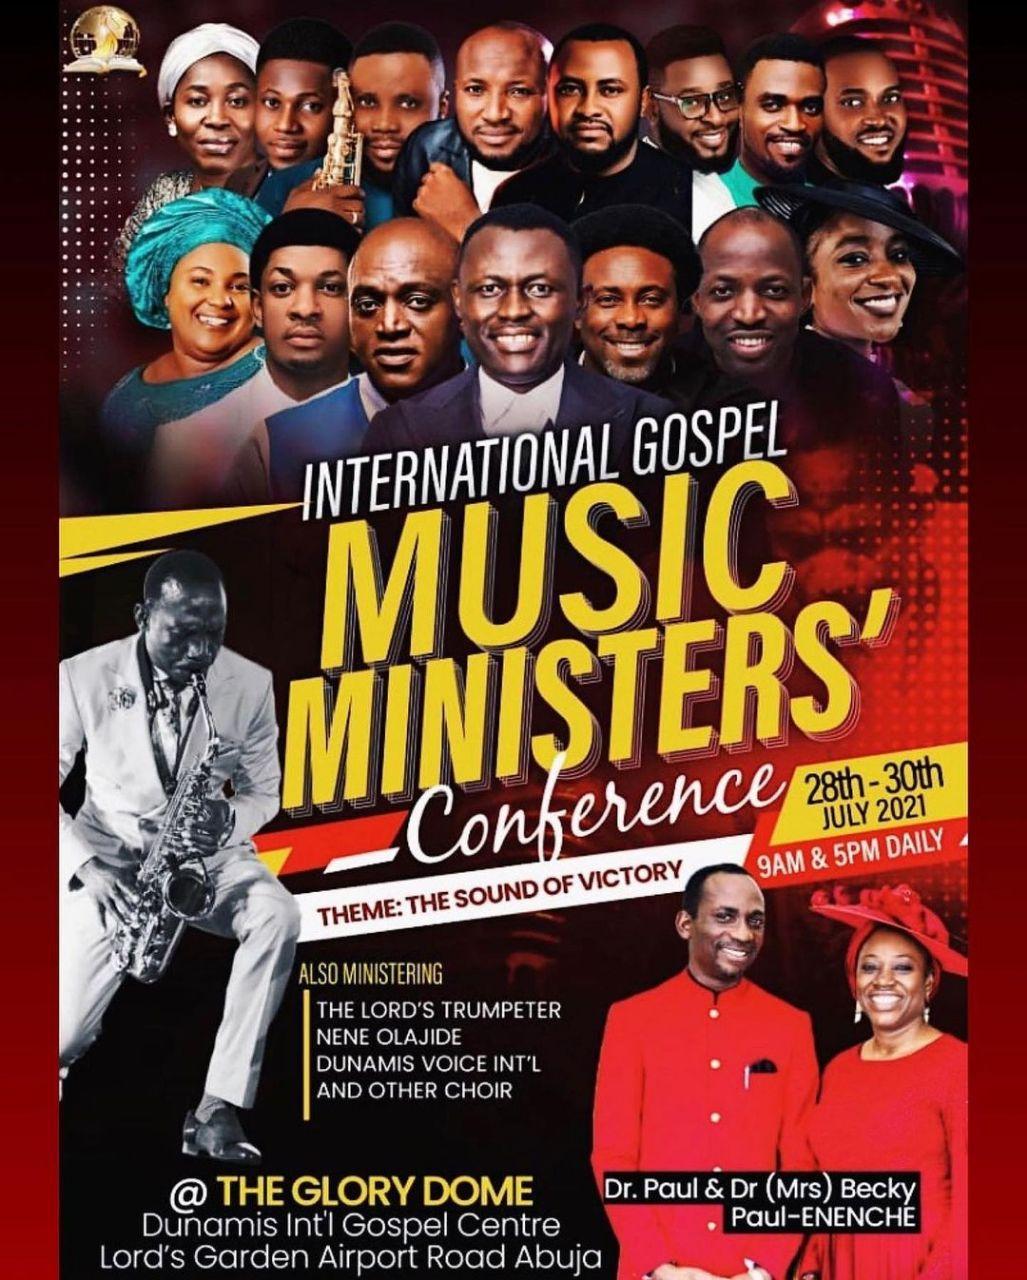 DUNAMIS INTERNATIONAL GOSPEL MUSIC MINISTER'S CONFERENCE